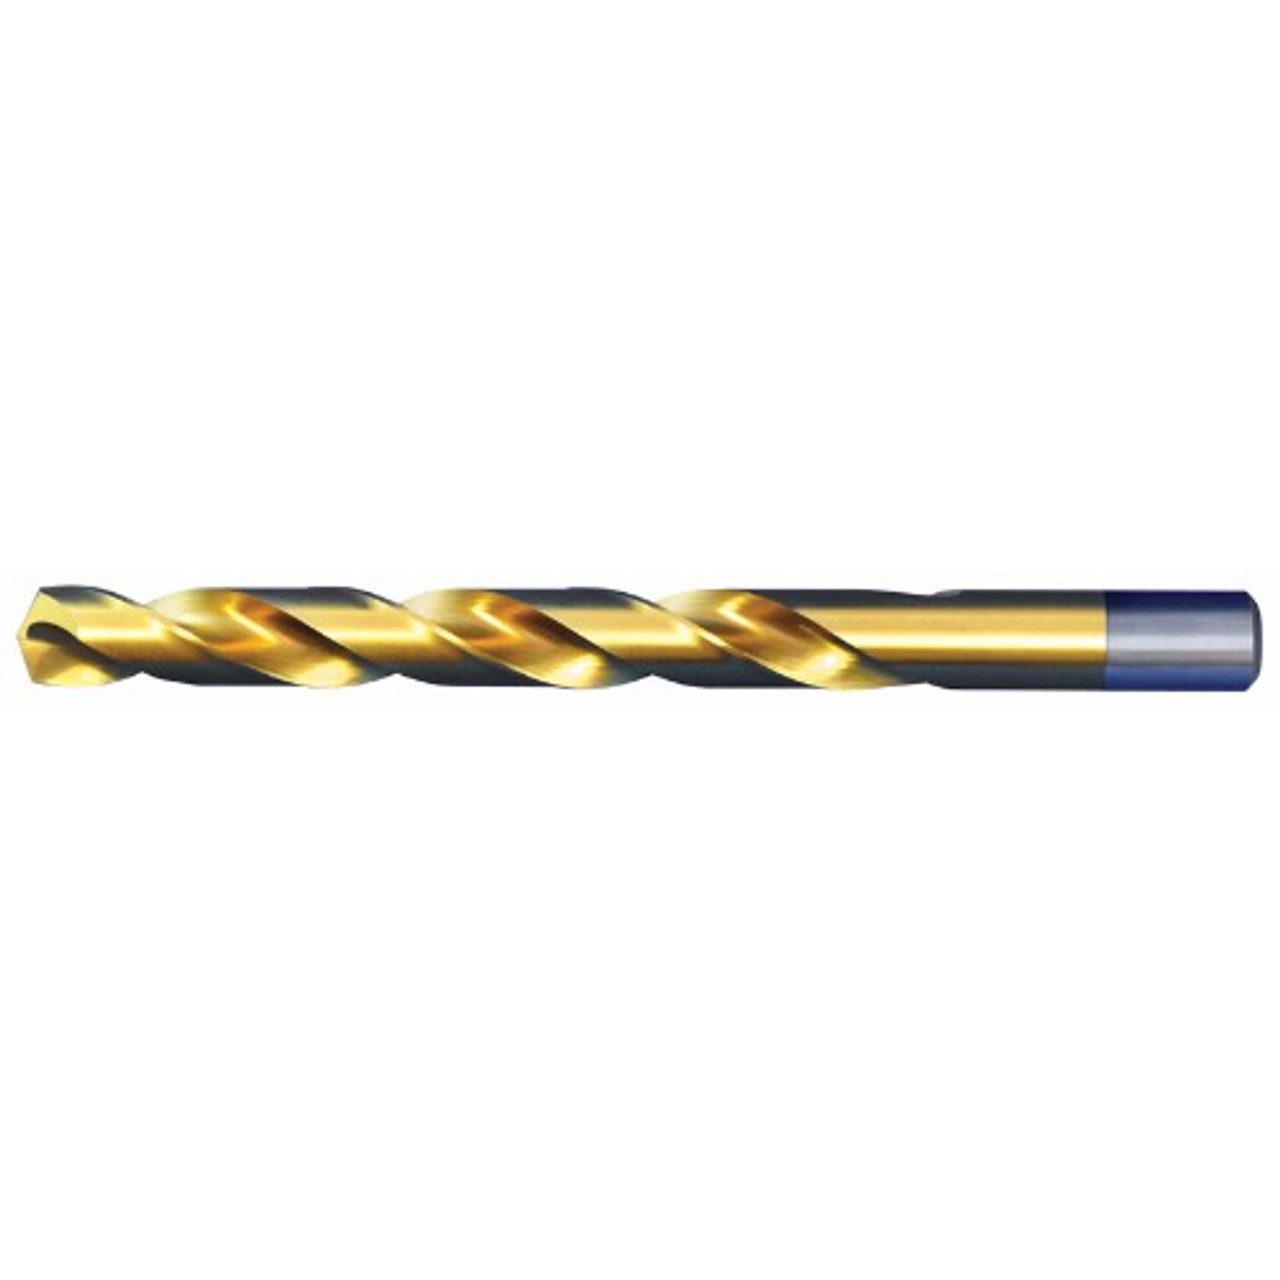 "USA /""O/"" Jobber Length Cobalt Drill Bit NEW"